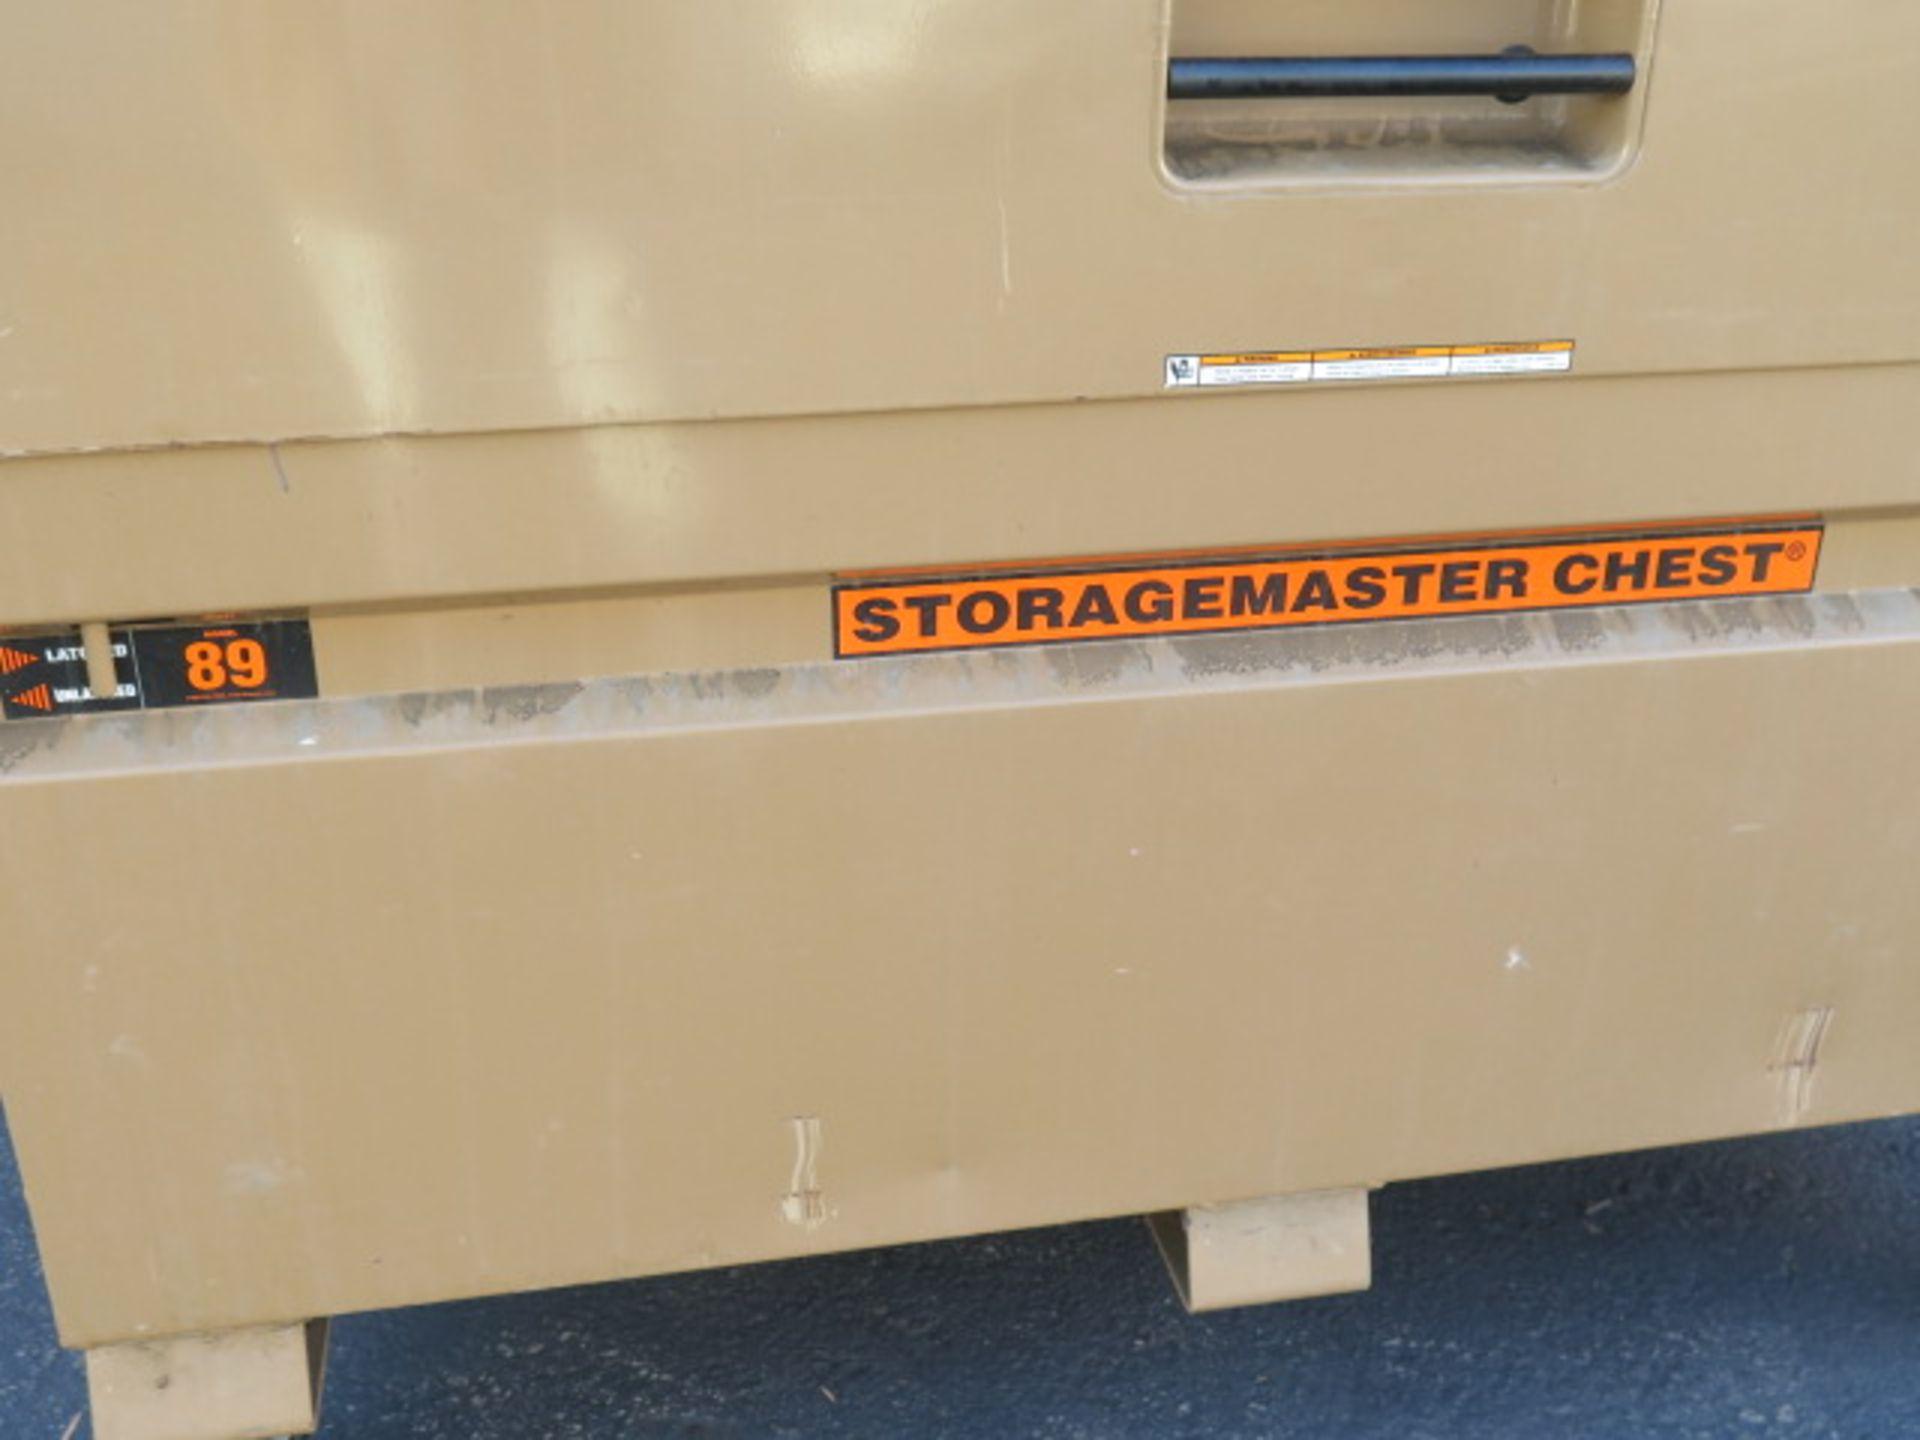 Knaack mdl. 89 Storagemaster Rolling Job Box (SOLD AS-IS - NO WARRANTY) - Image 4 of 11